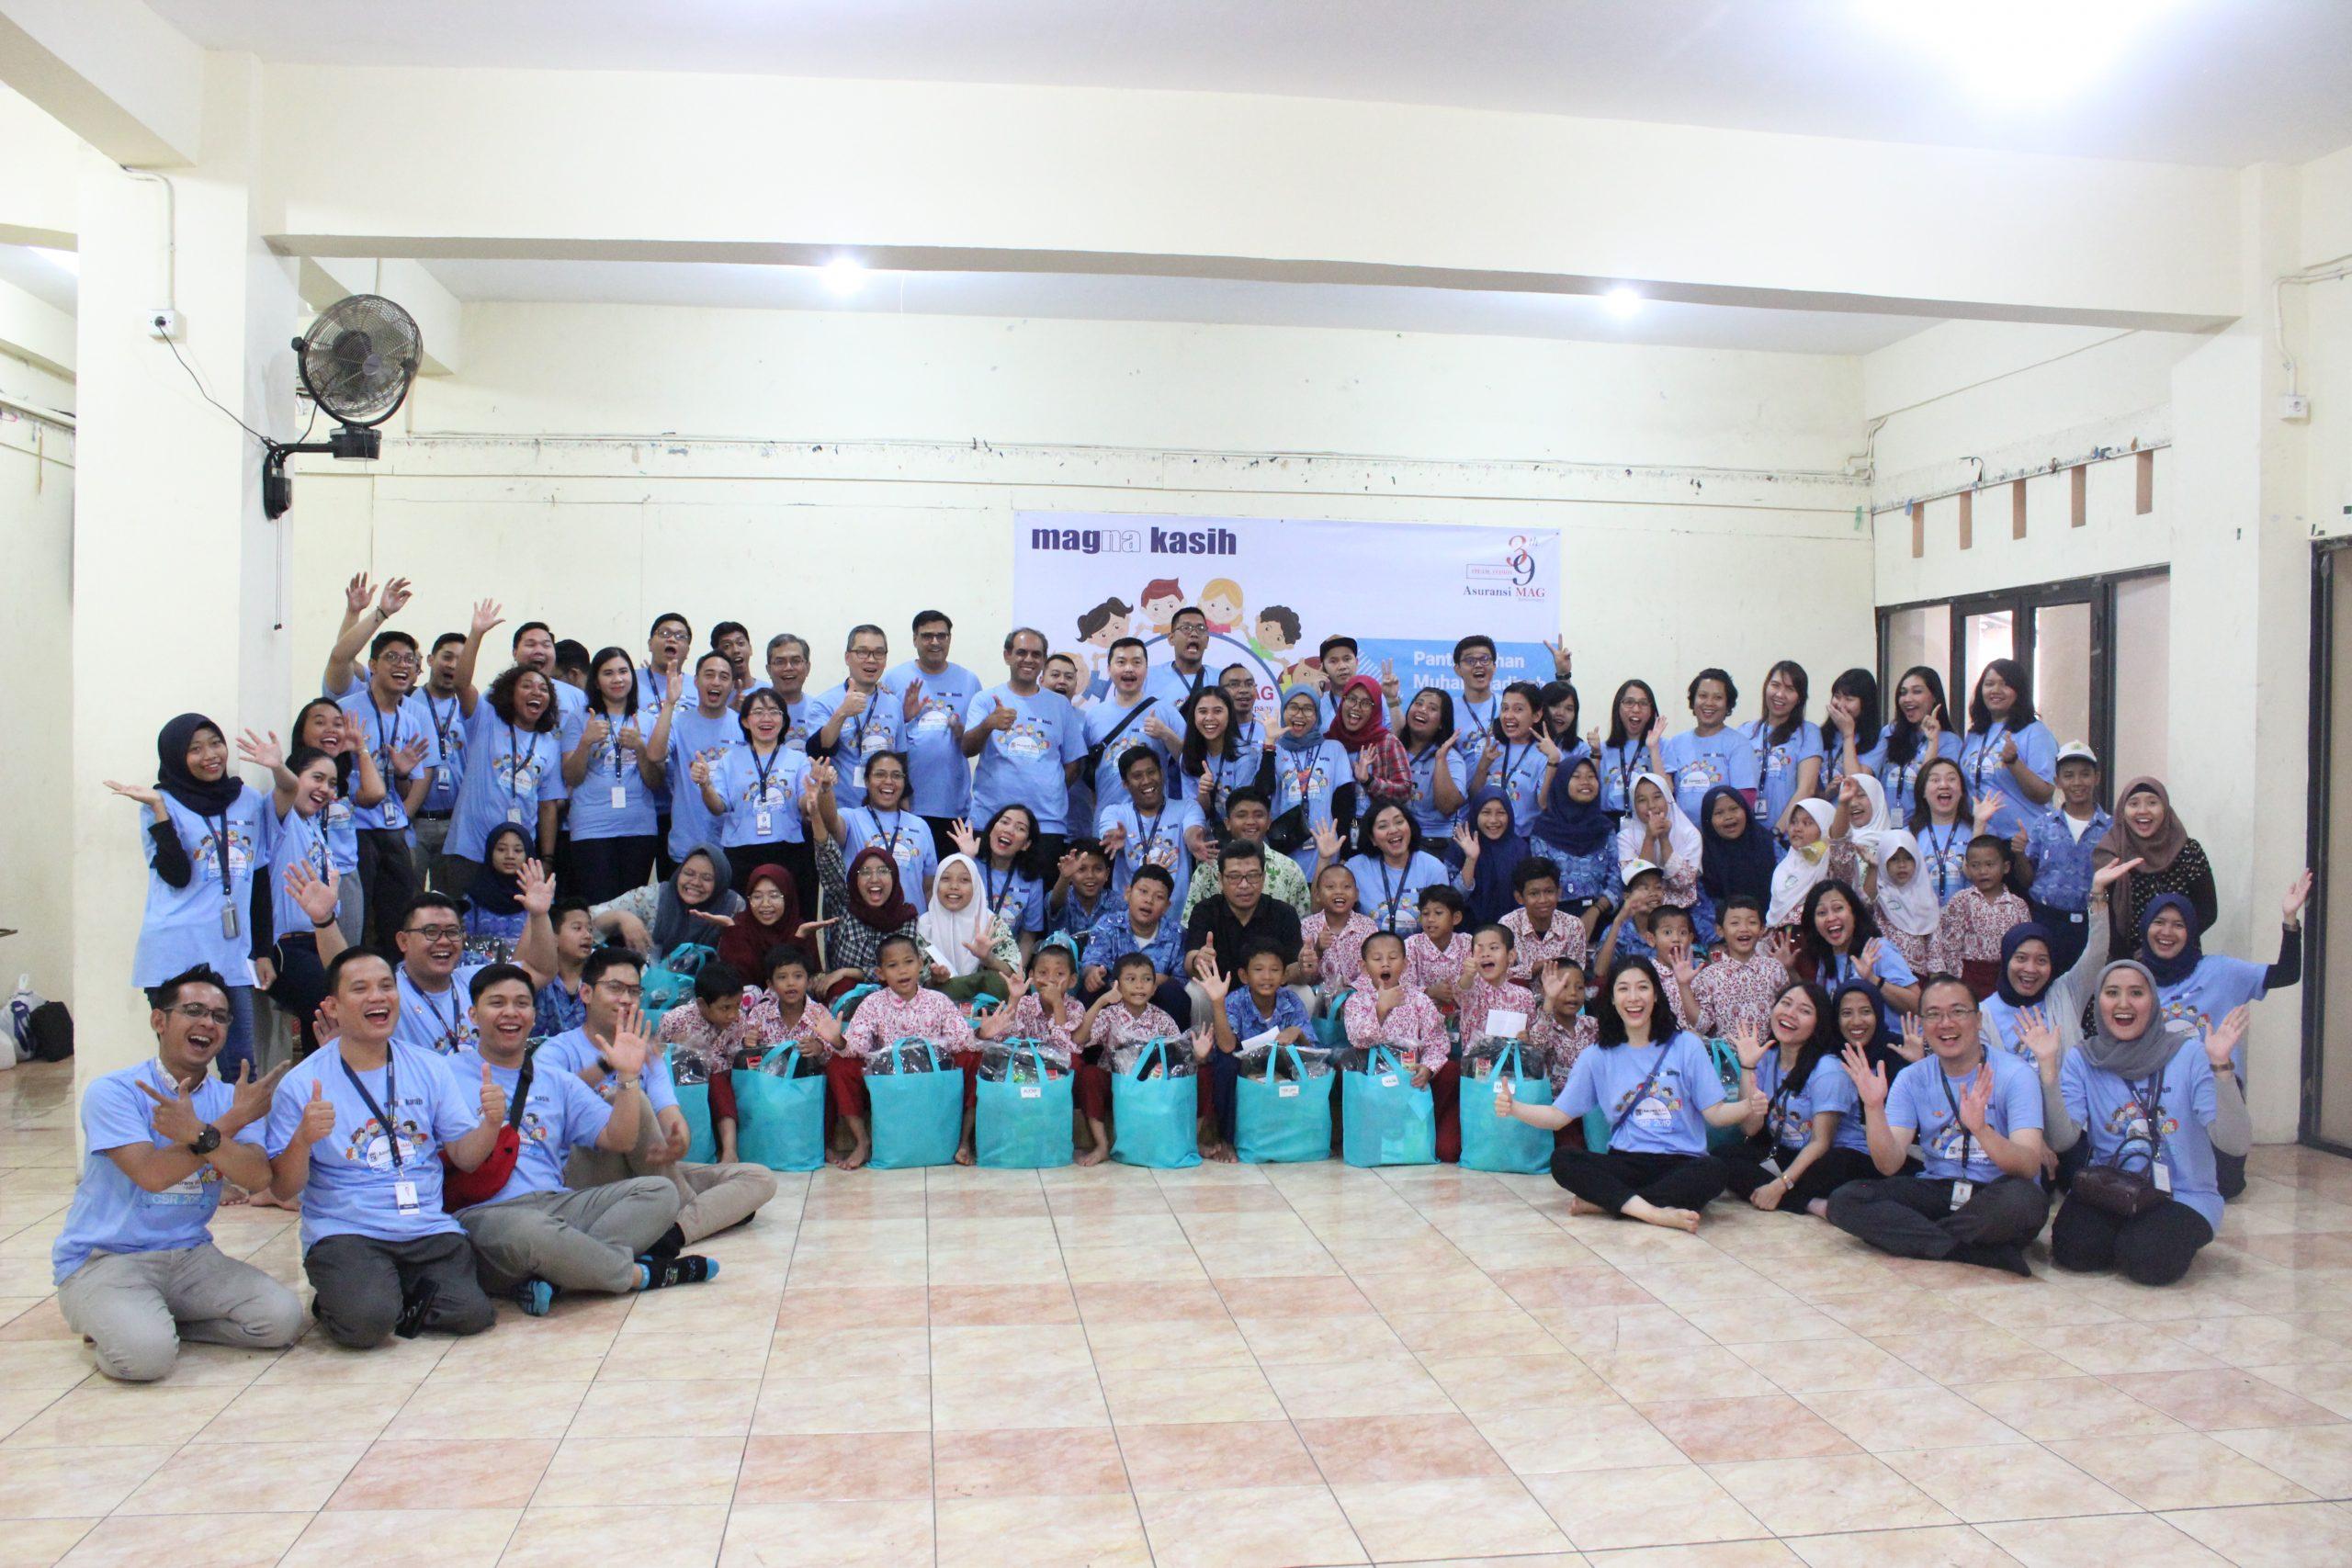 Magna Kasih Peduli Panti Asuhan Muhammadiyah Jakarta (14 November 2019)